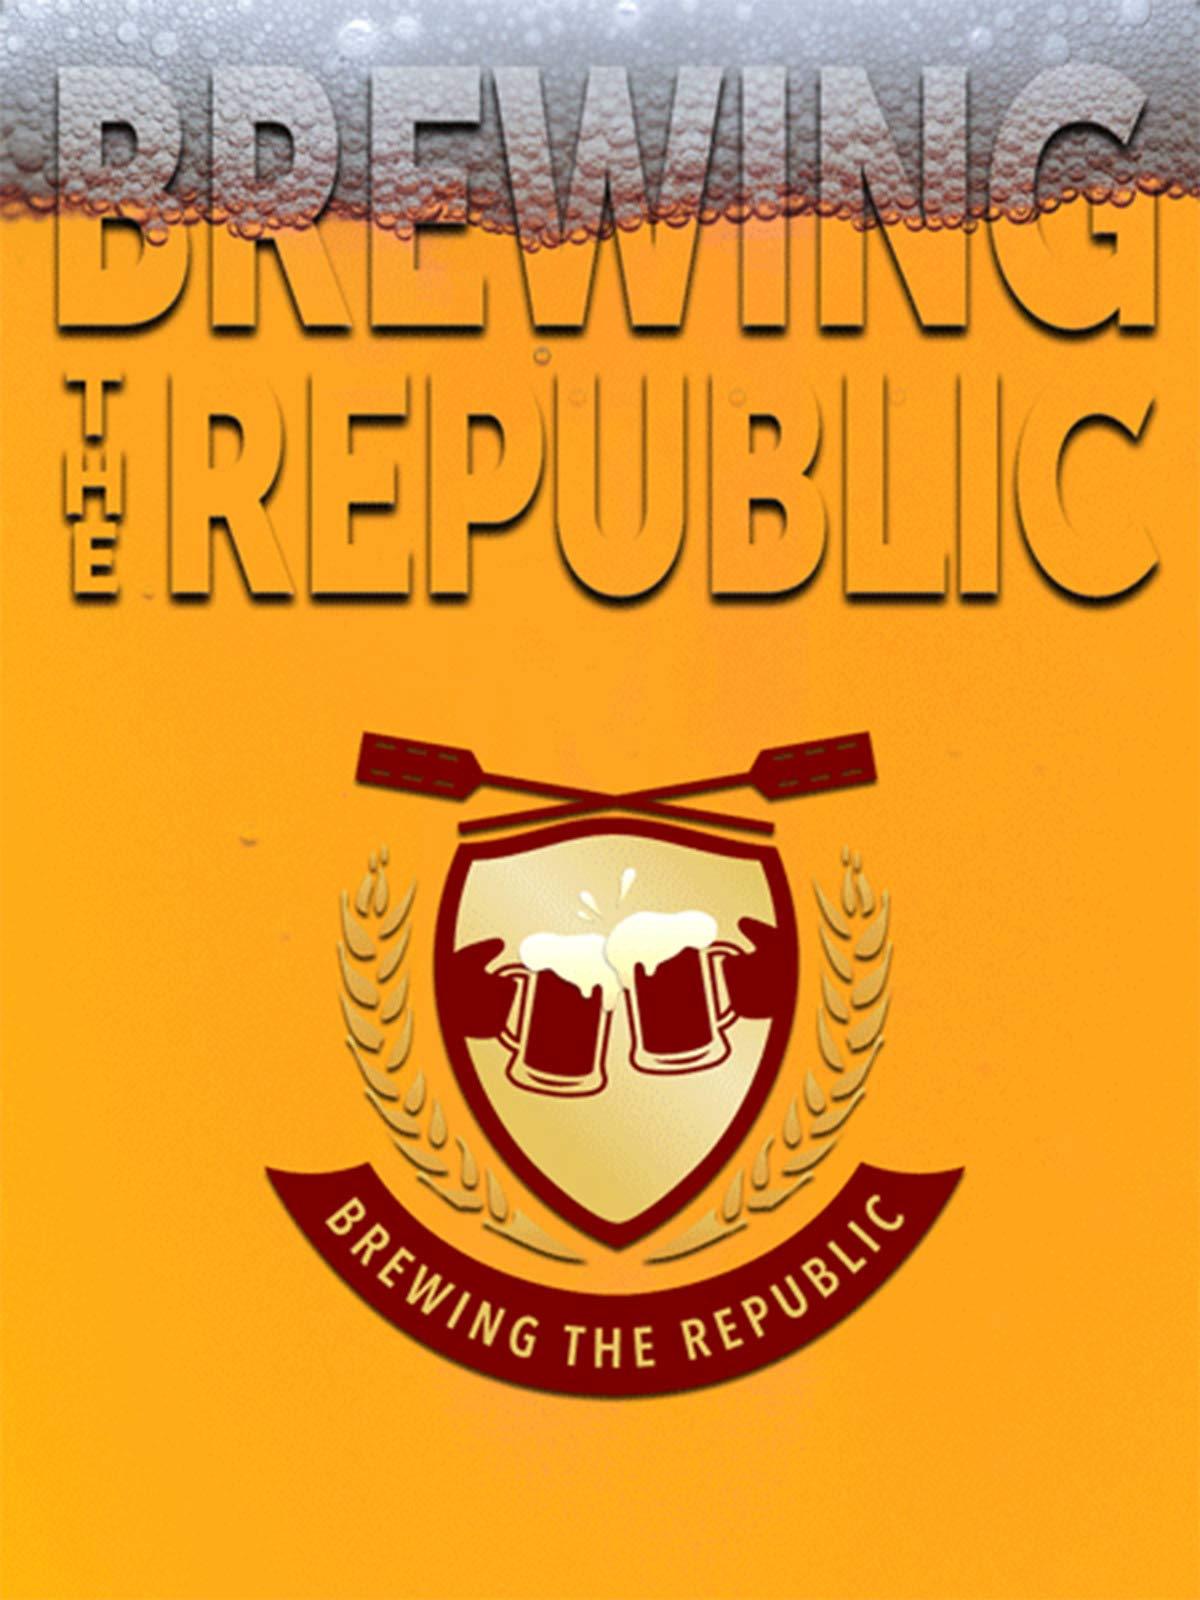 Brewing the Republic